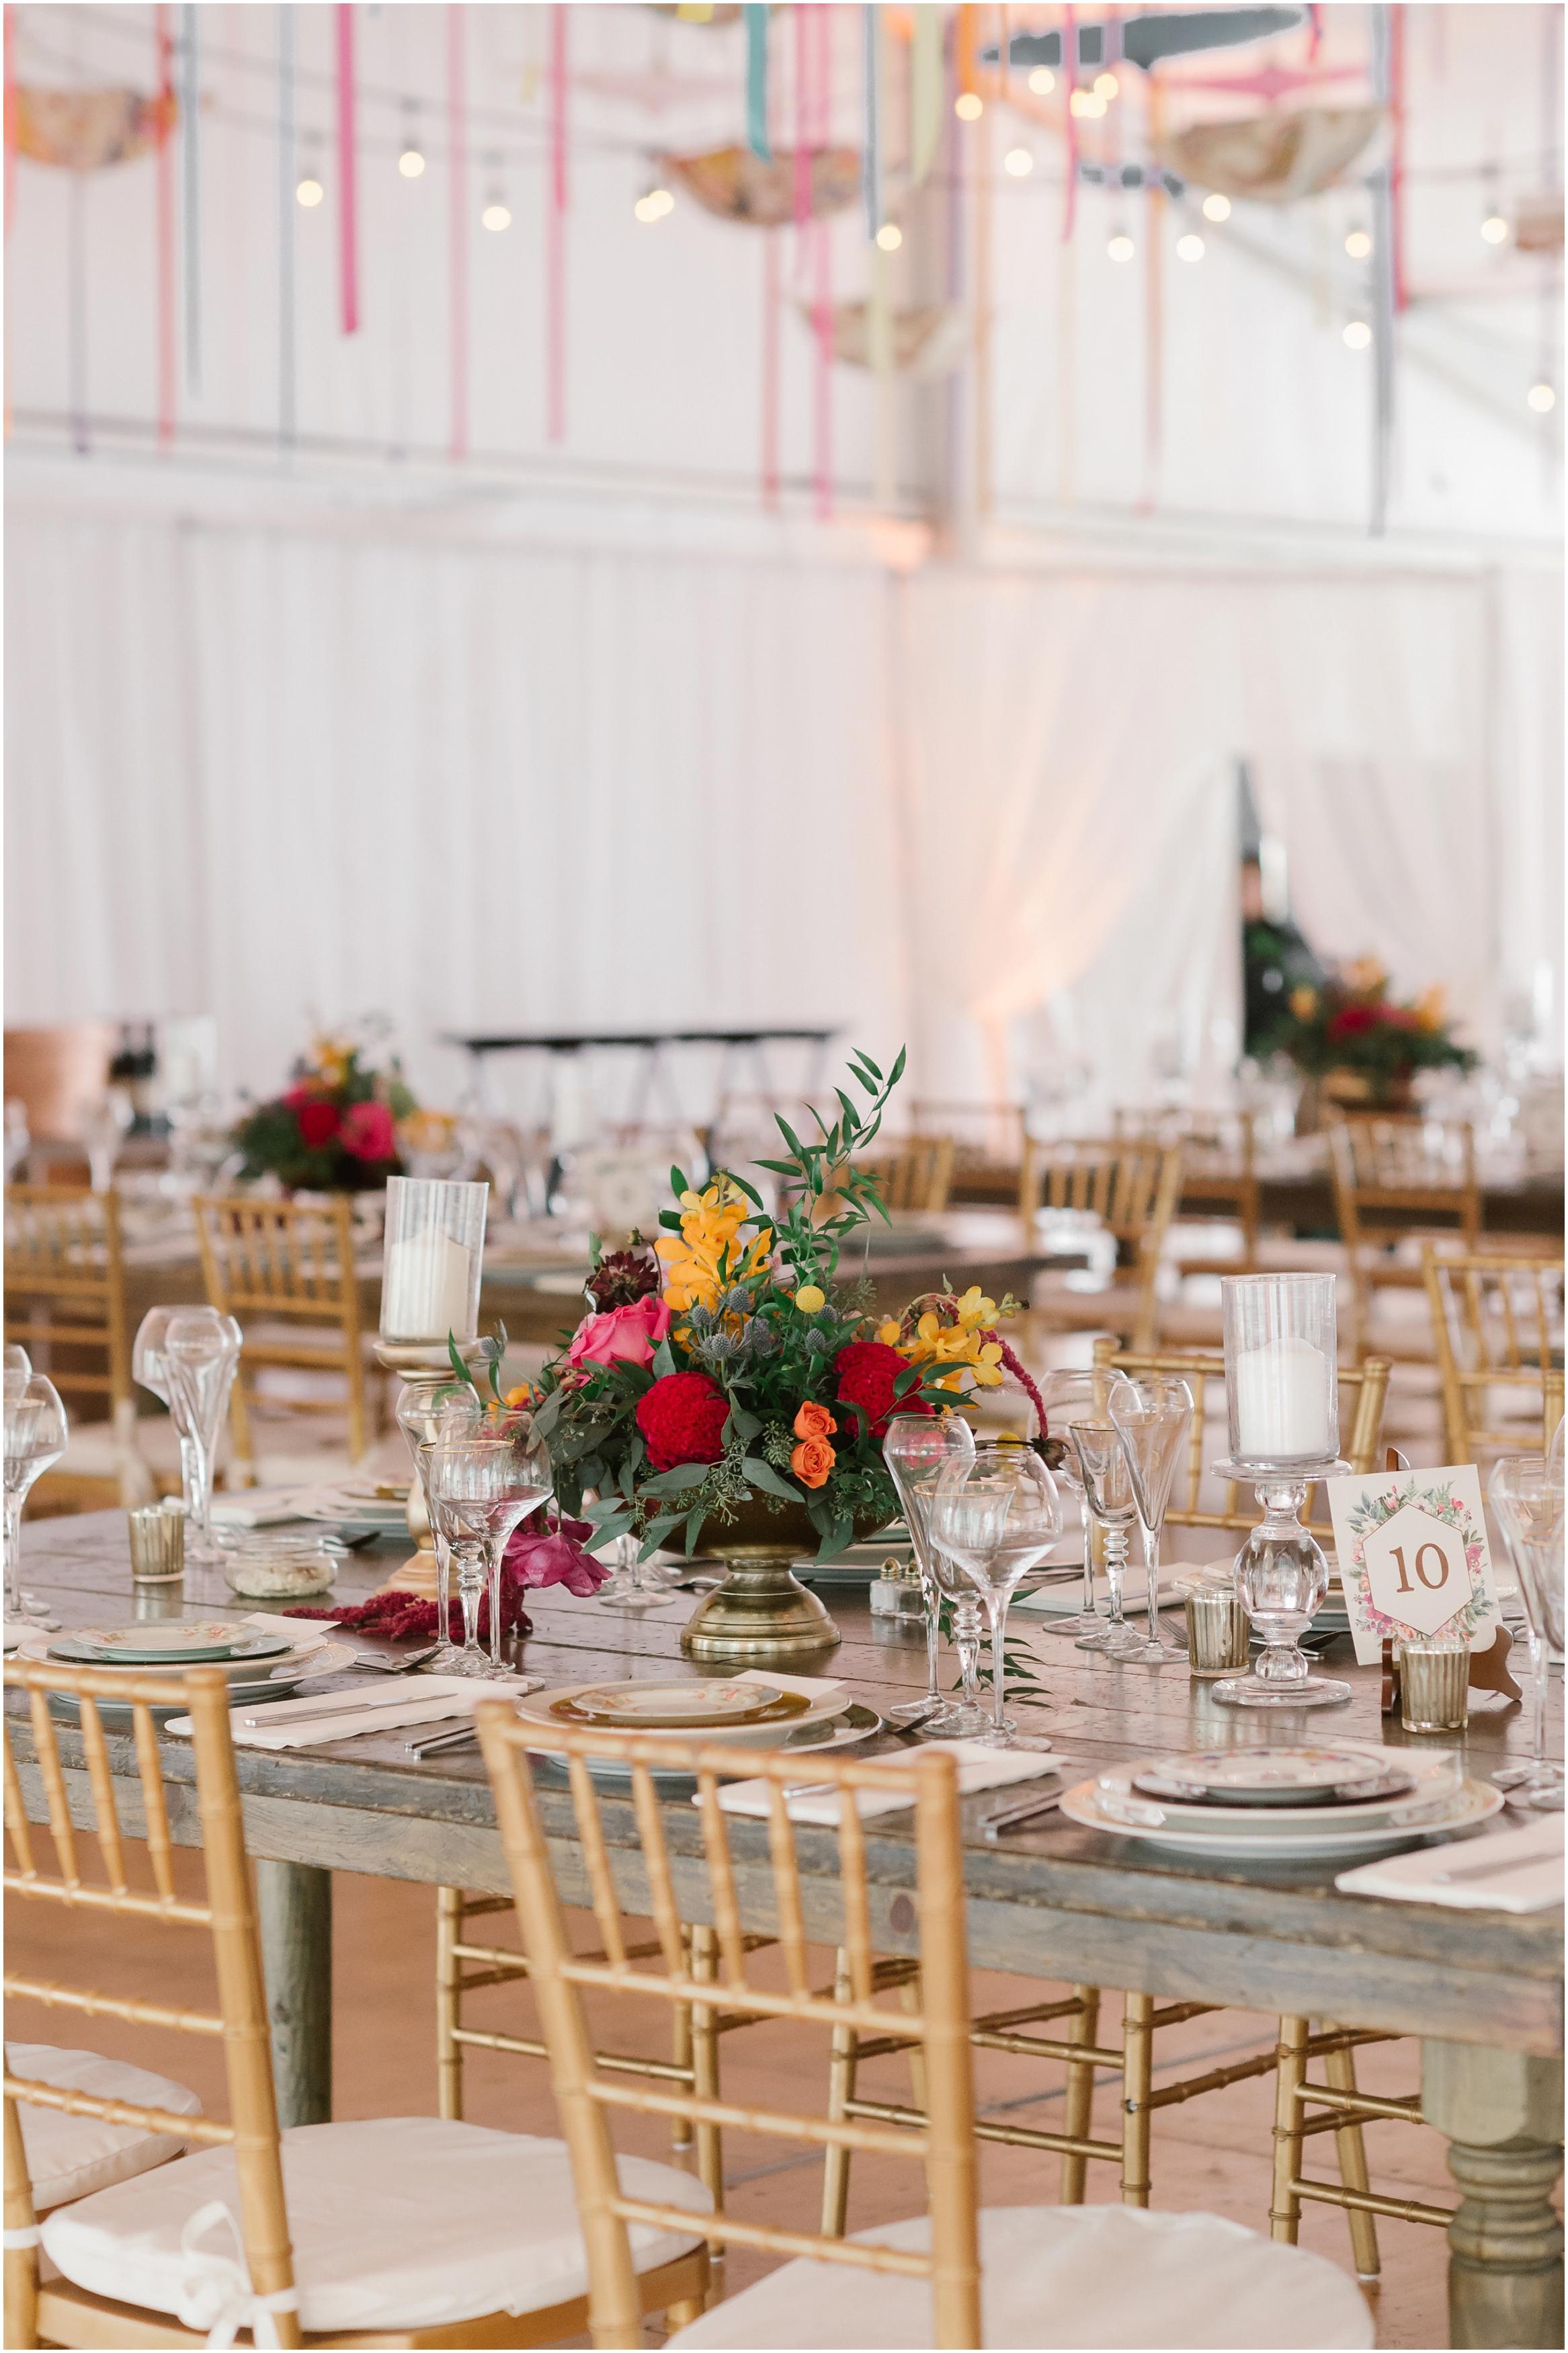 Rebecca_Shehorn_Photography_Indianapolis_Wedding_Photographer_9286.jpg